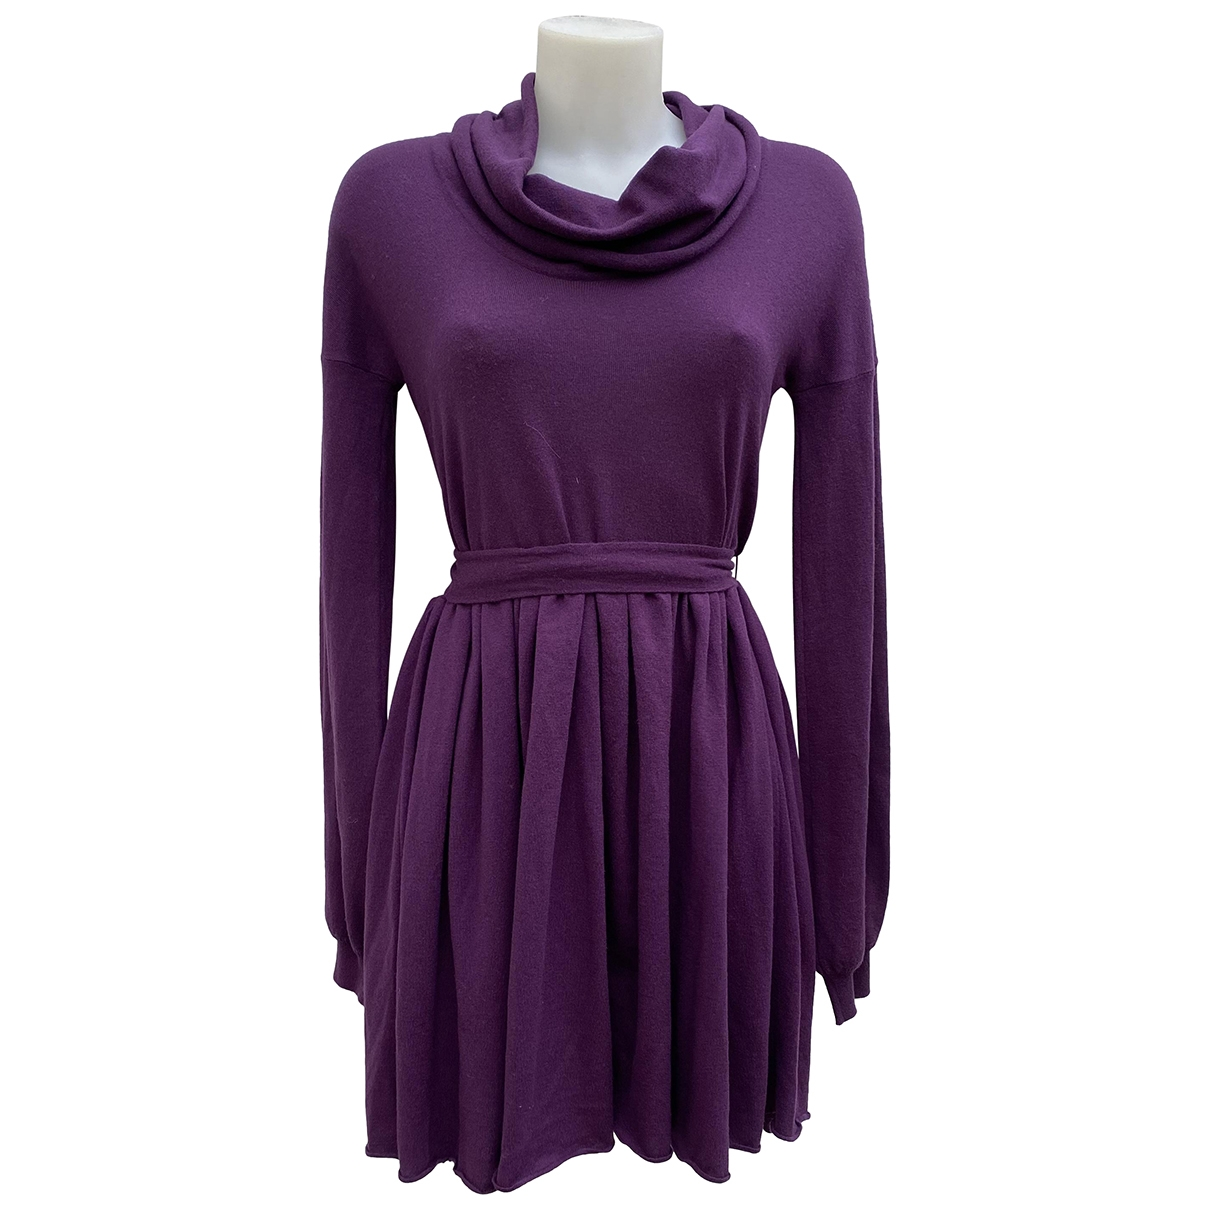 Stella Mccartney \N Kleid in  Lila Wolle